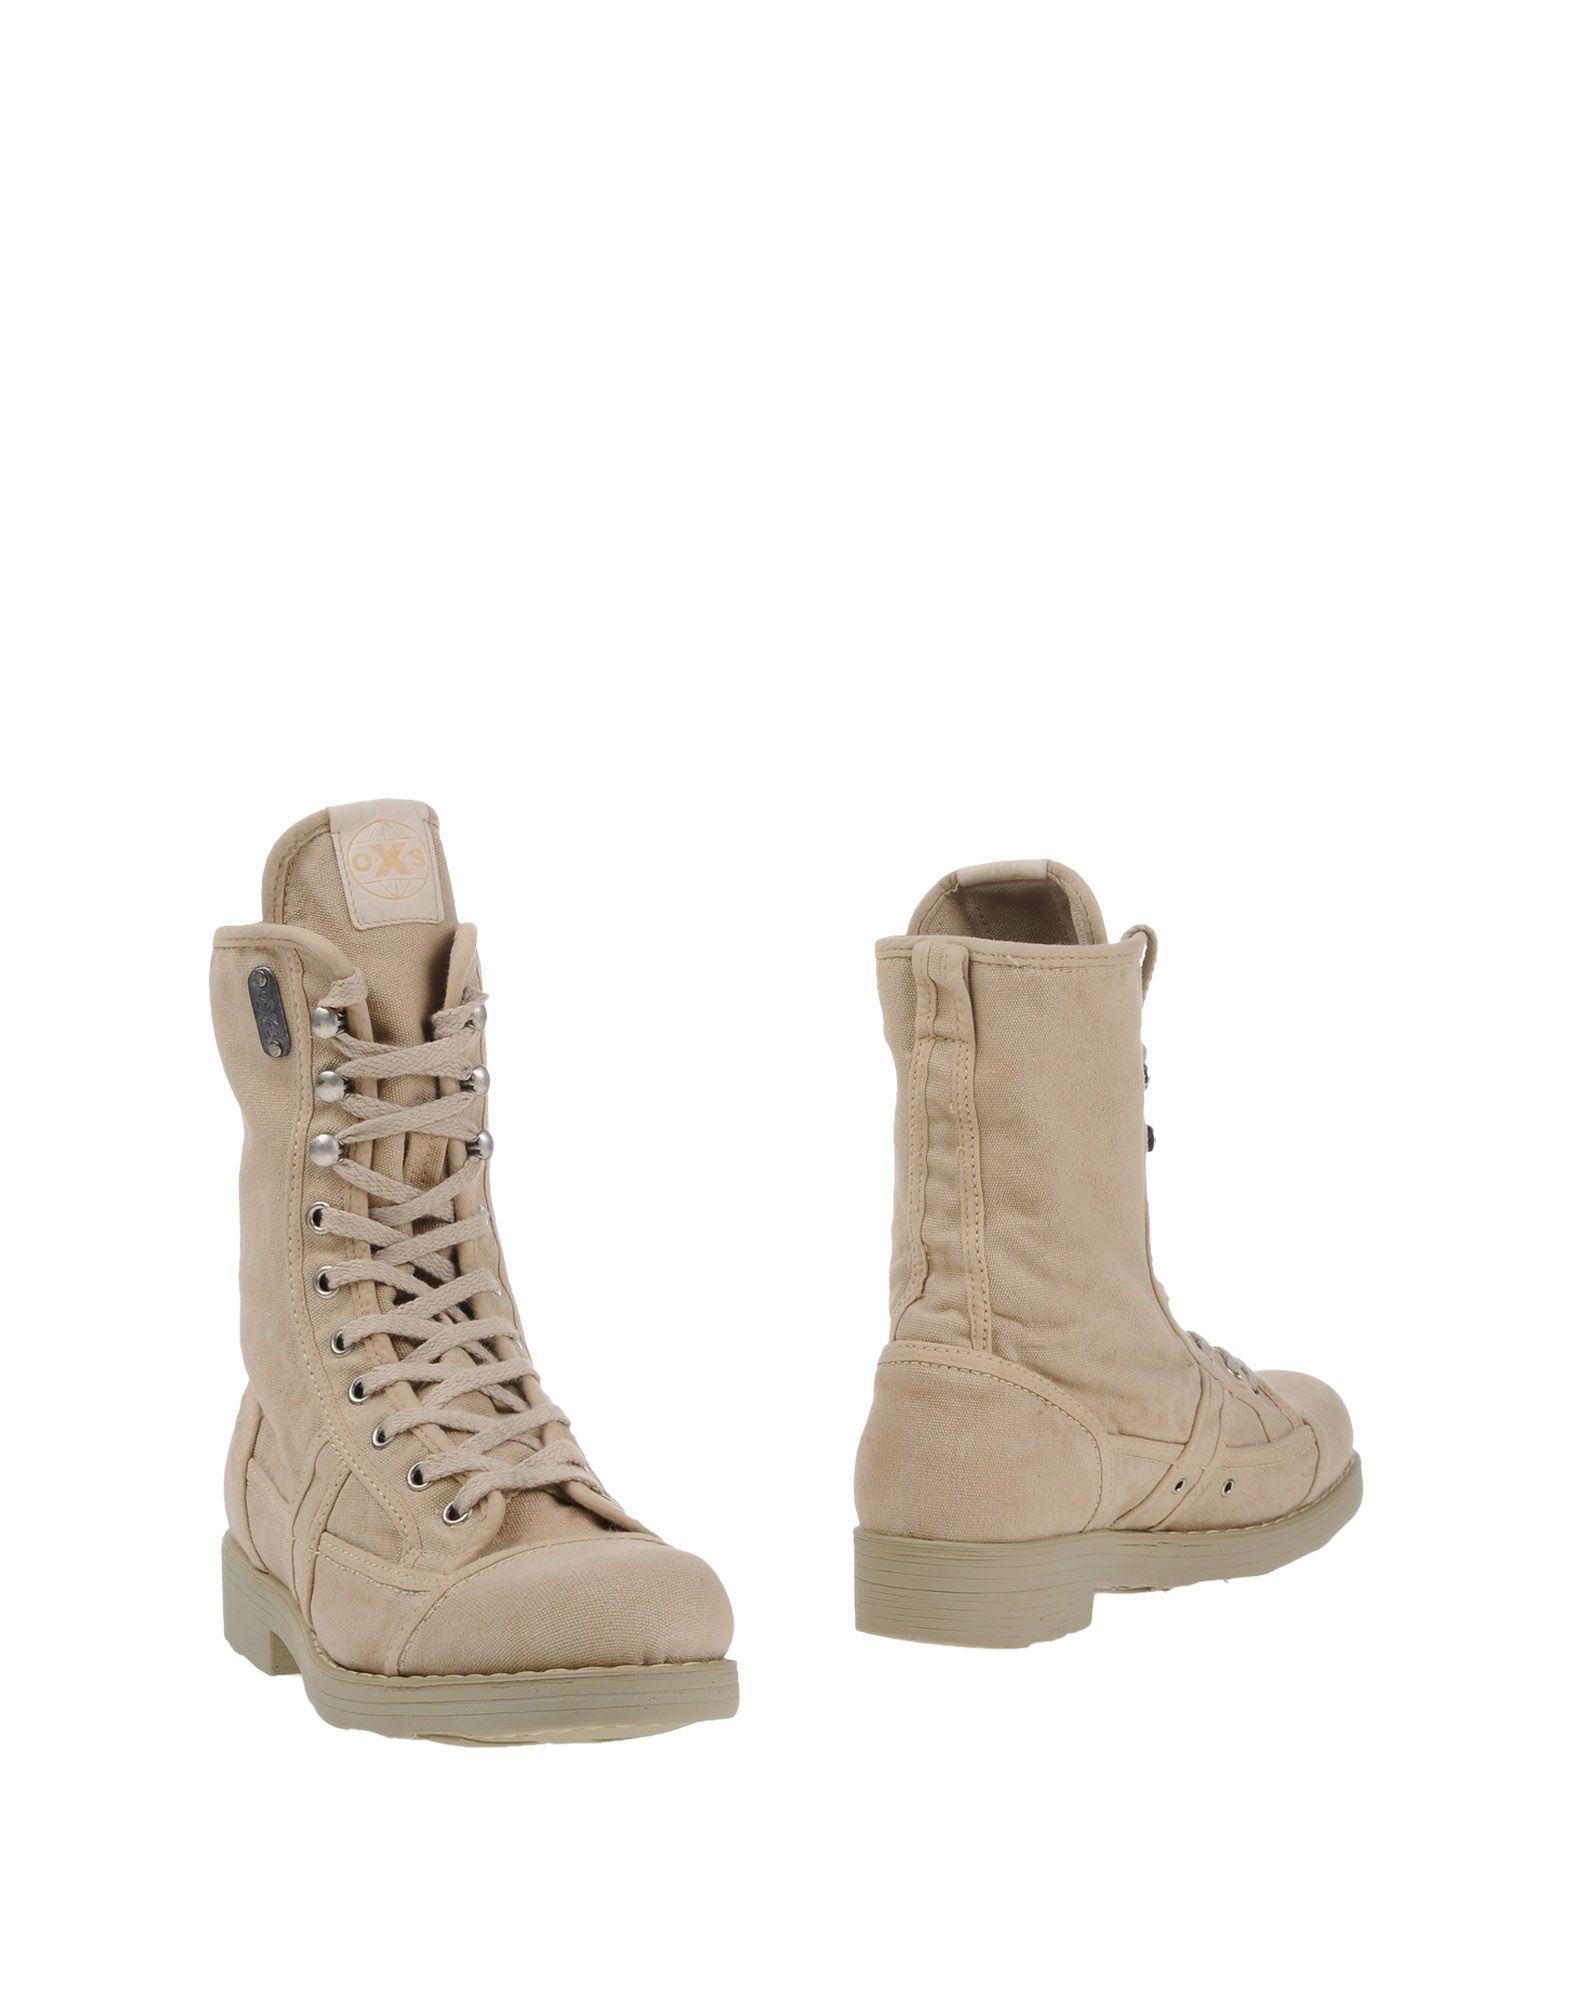 Stilvolle billige Schuhe Schuhe Schuhe O.X.S. Stiefelette Damen  11191767MP 7fd16d